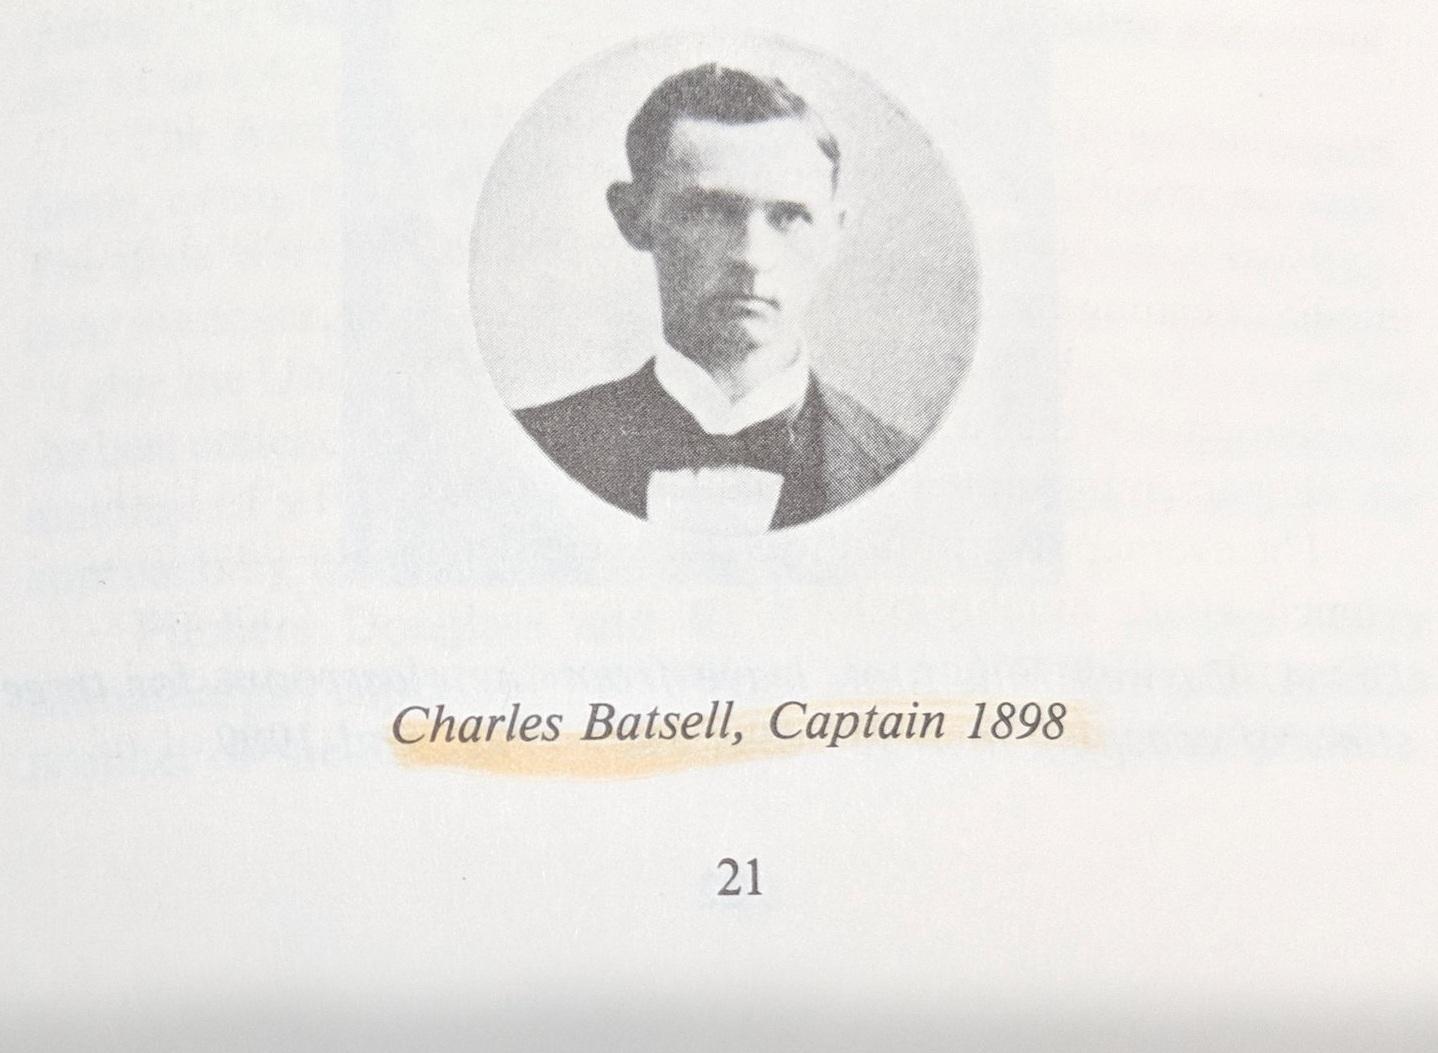 Captain Charles Batsell